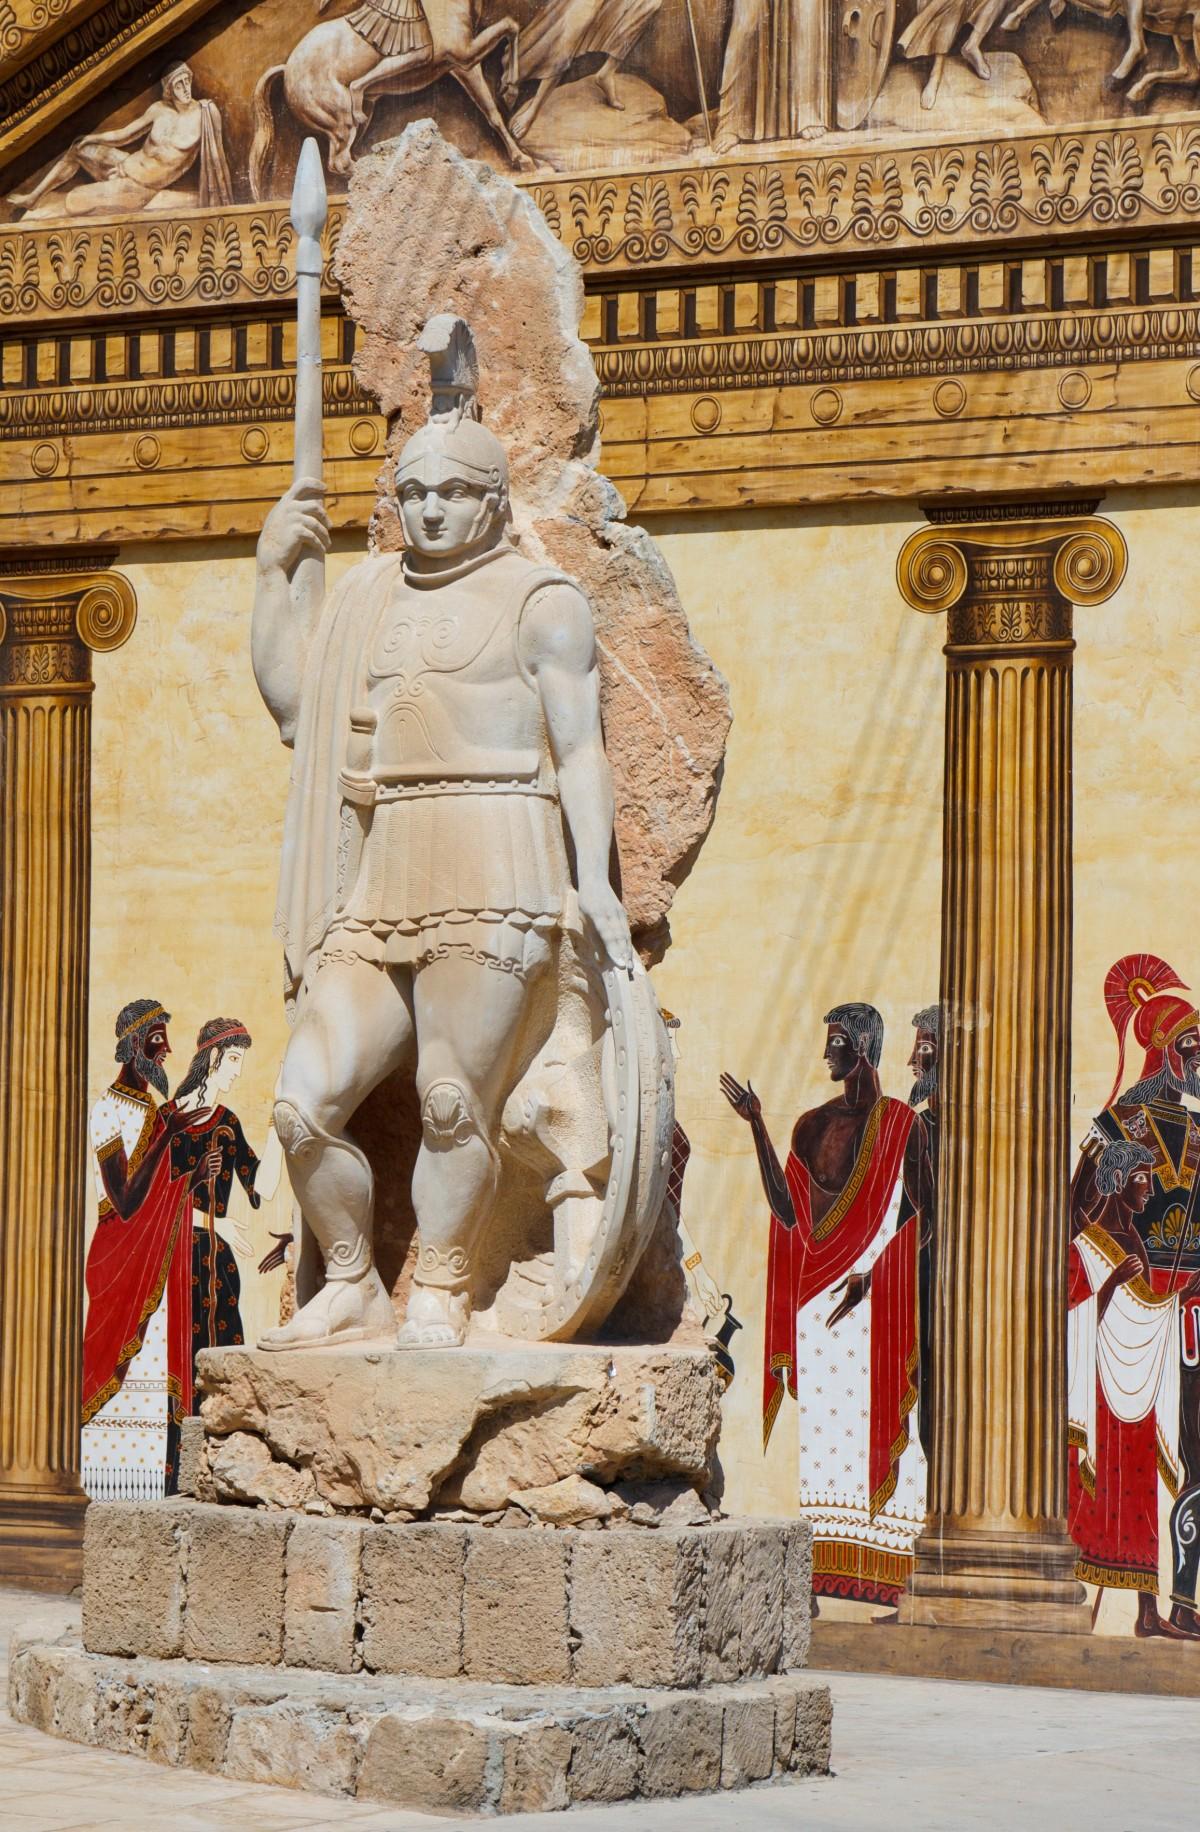 the pillars of the roman empire's